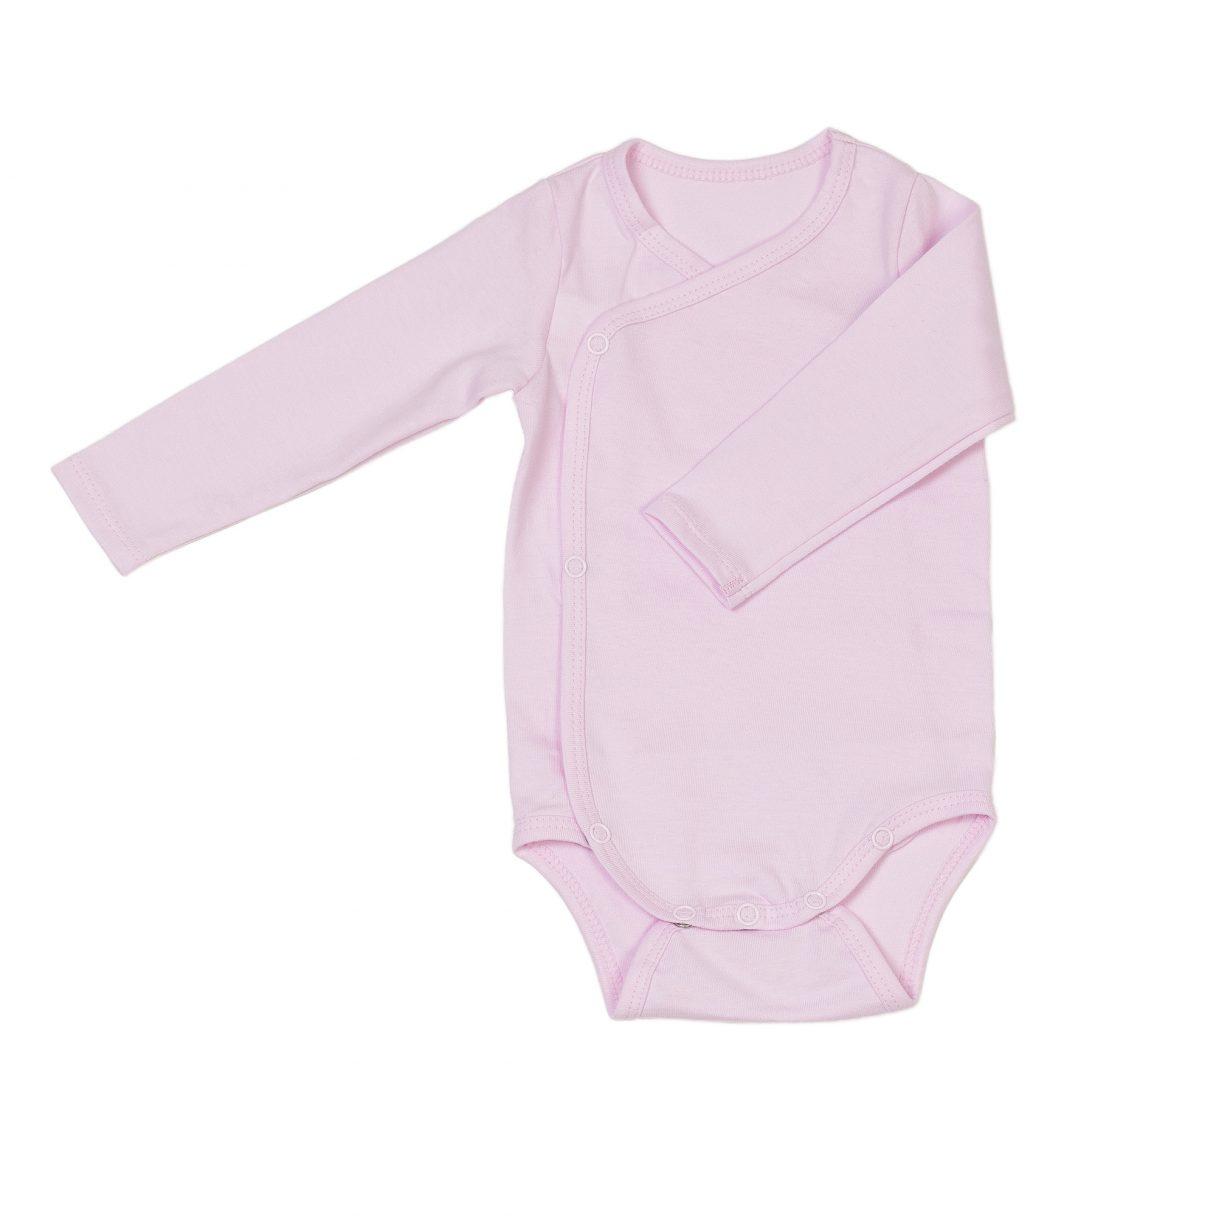 Newborn organic cotton baby bodysuit pink